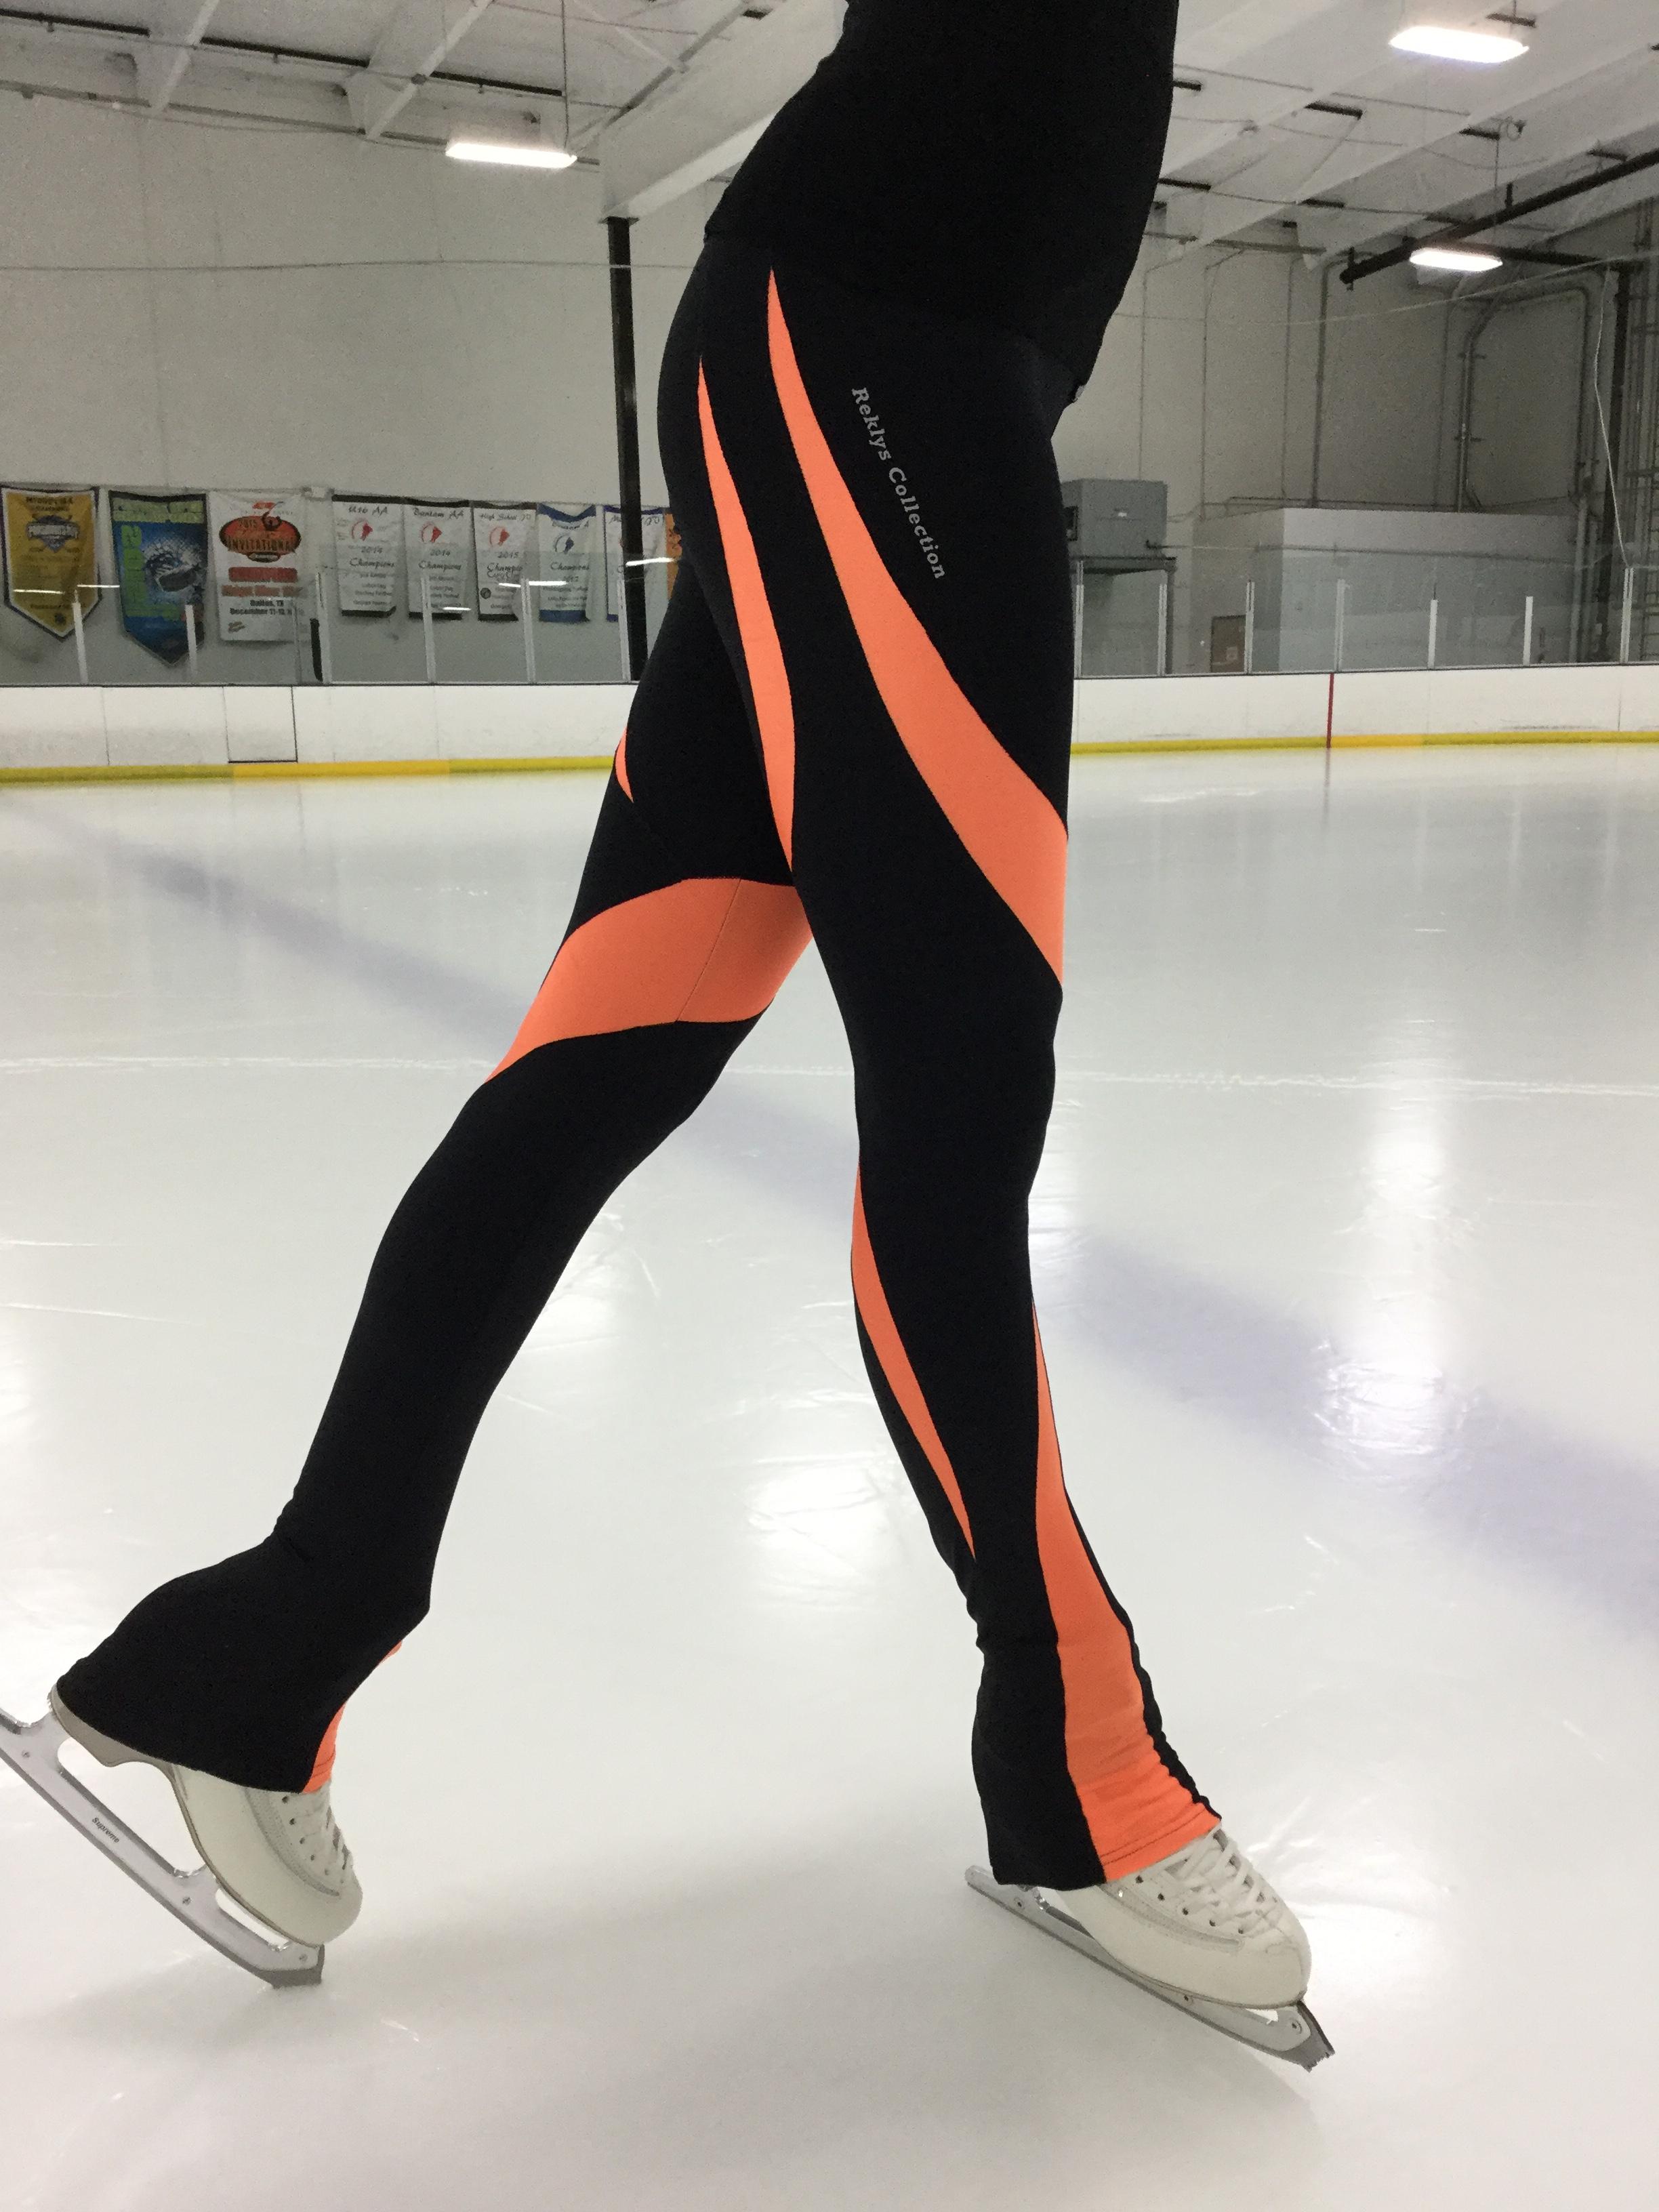 bebf34aaebbd0 Home/CHILDREN COLLECTION/LEGGINGS. Girls Skating Leggings Black/Orange